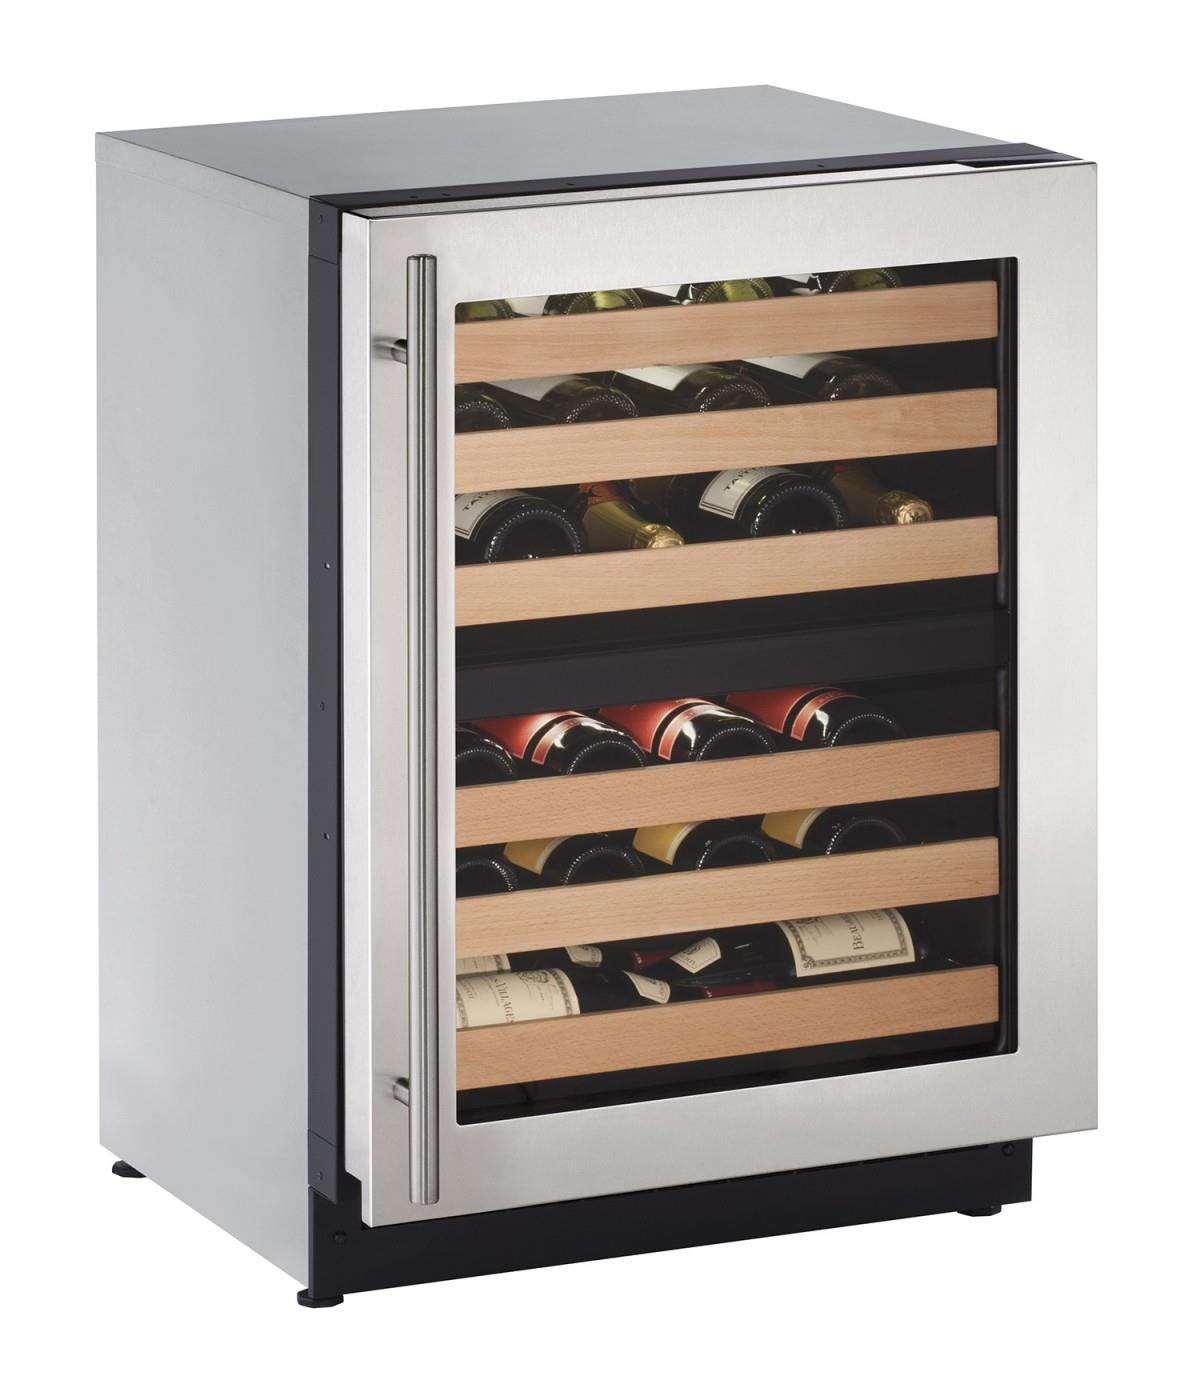 "U-Line Wine Captains 4.7 Cu. Ft. 24"" Built-in Wine Storage - Item Number: U-2224ZWCS-00A"